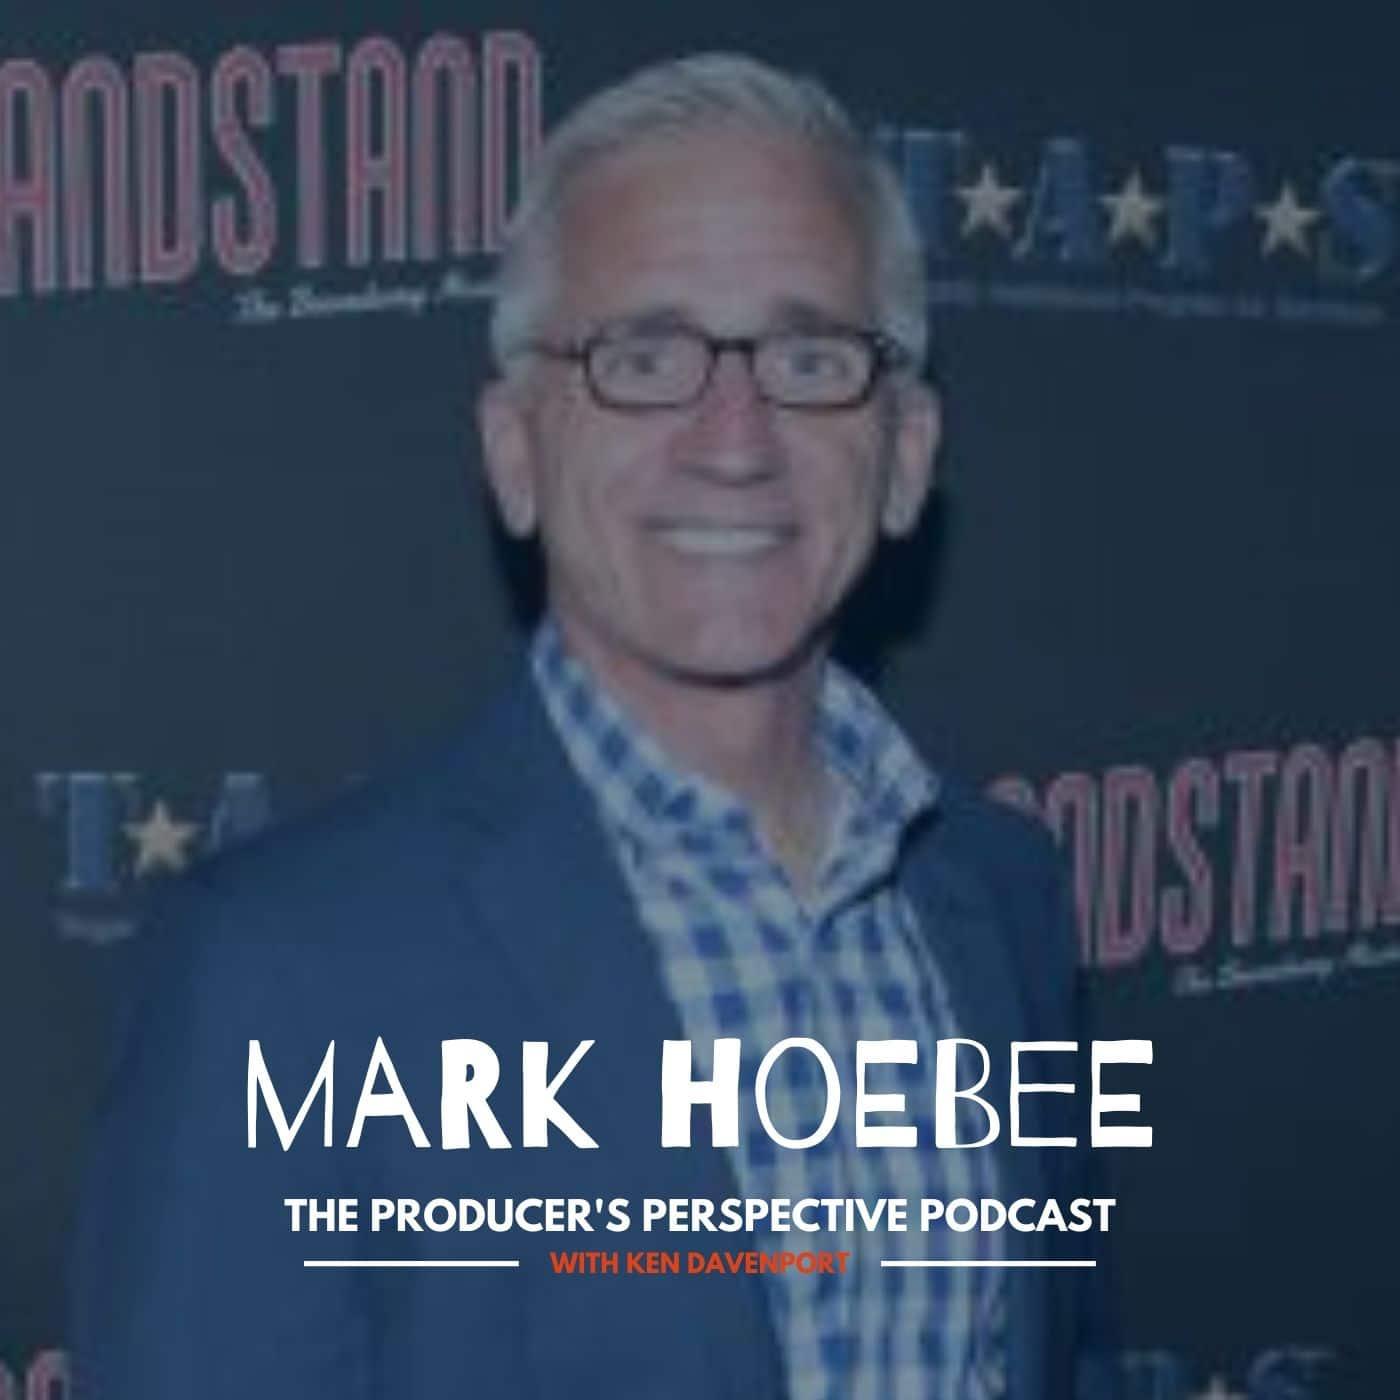 Ken Davenport's The Producer's Perspective Podcast Episode 140 - Mark Hoebee